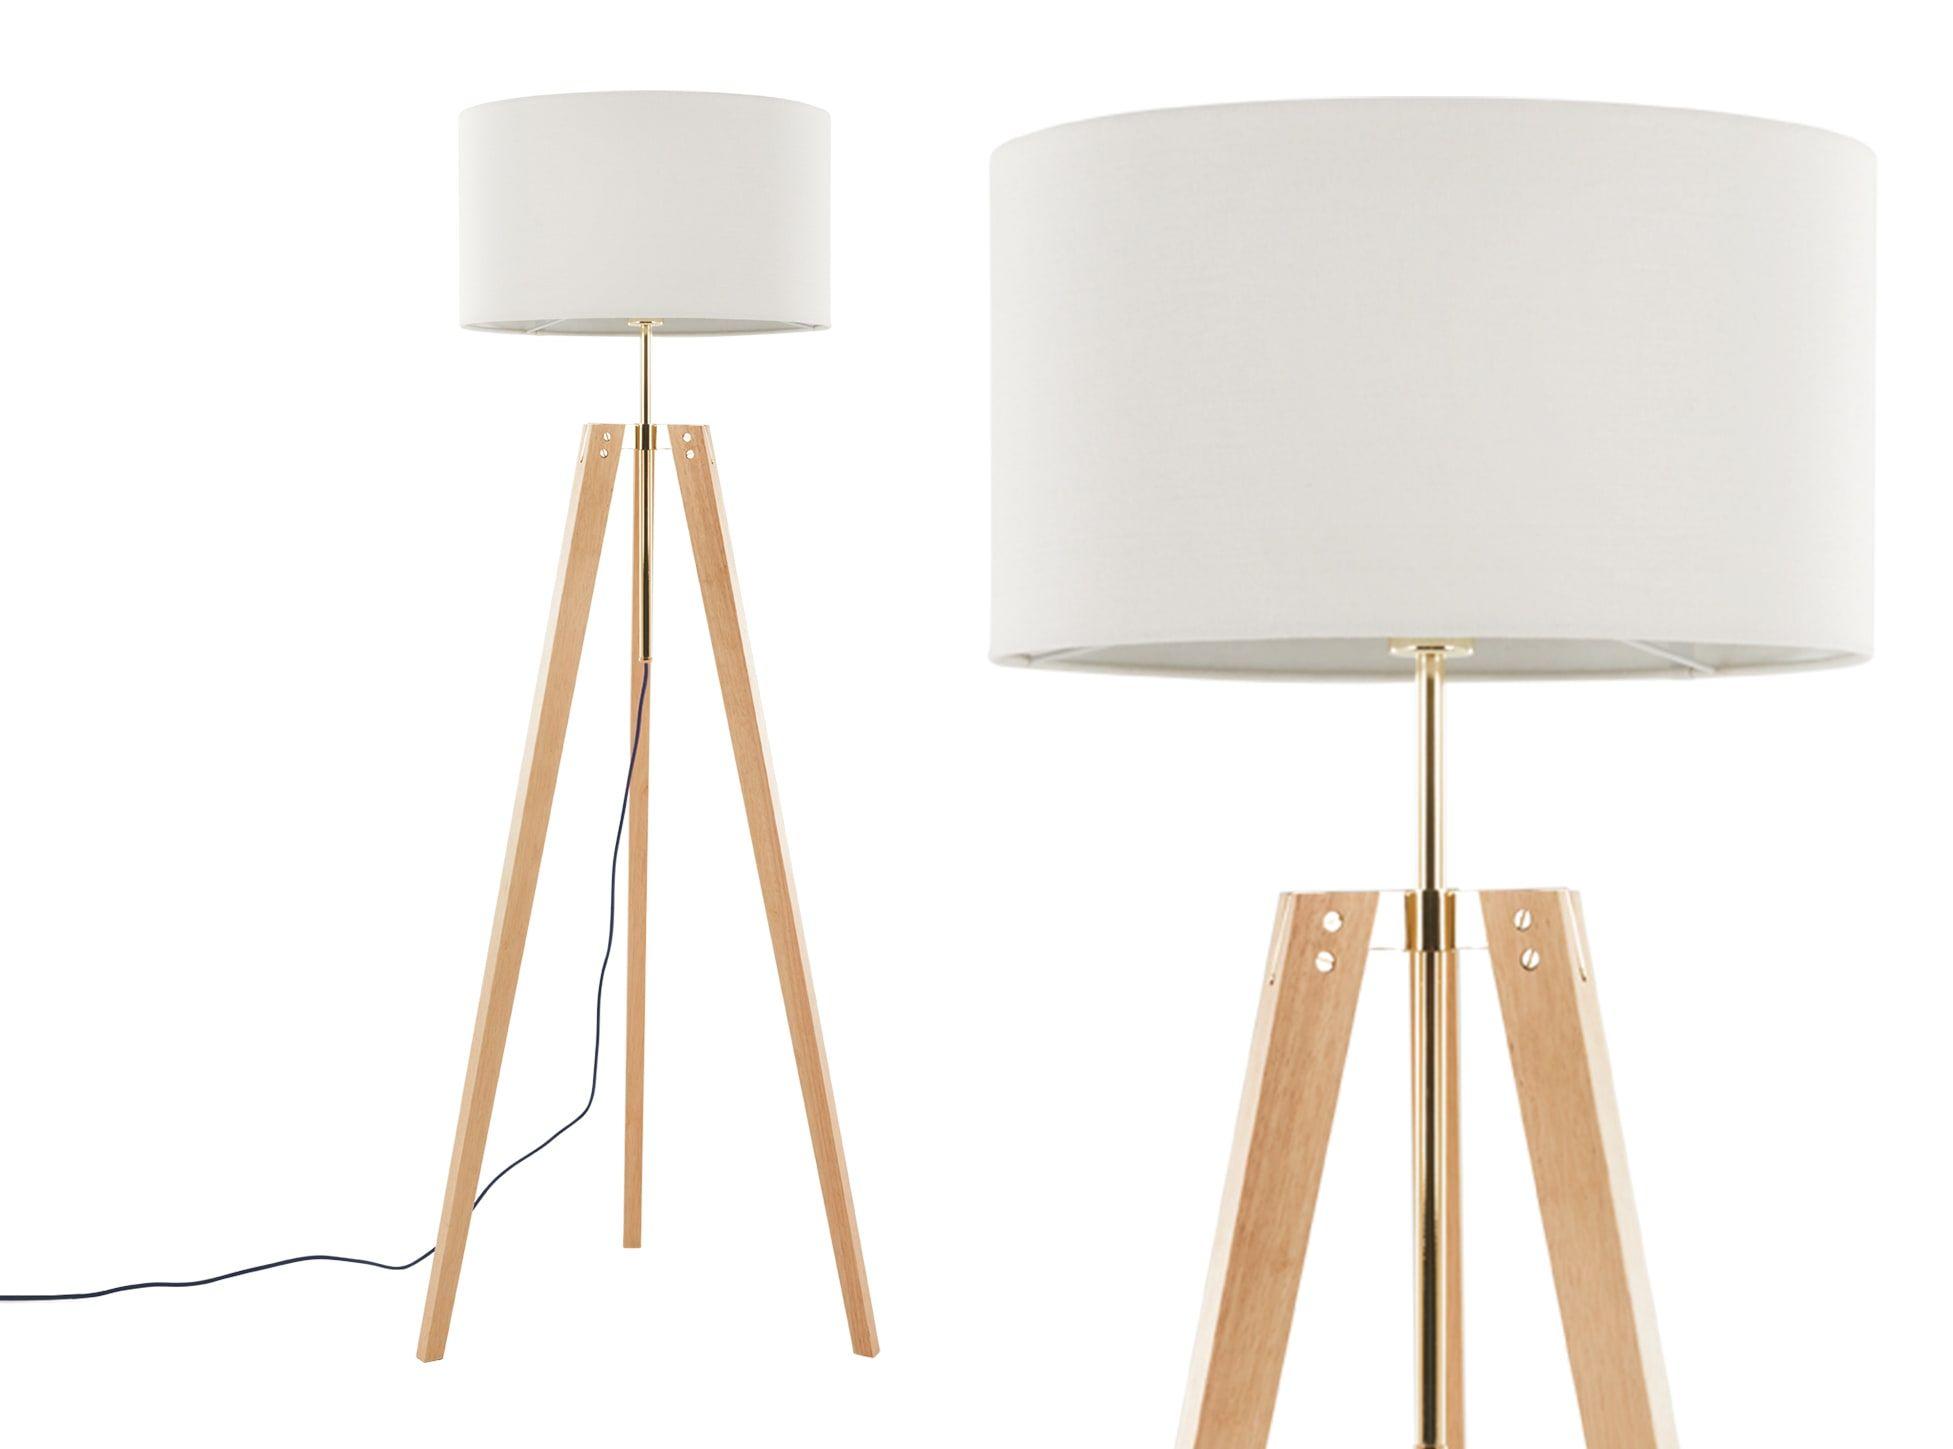 Irvin Tripod Stehlampe Holz Und Weiss Wooden Floor Lamps Tripod